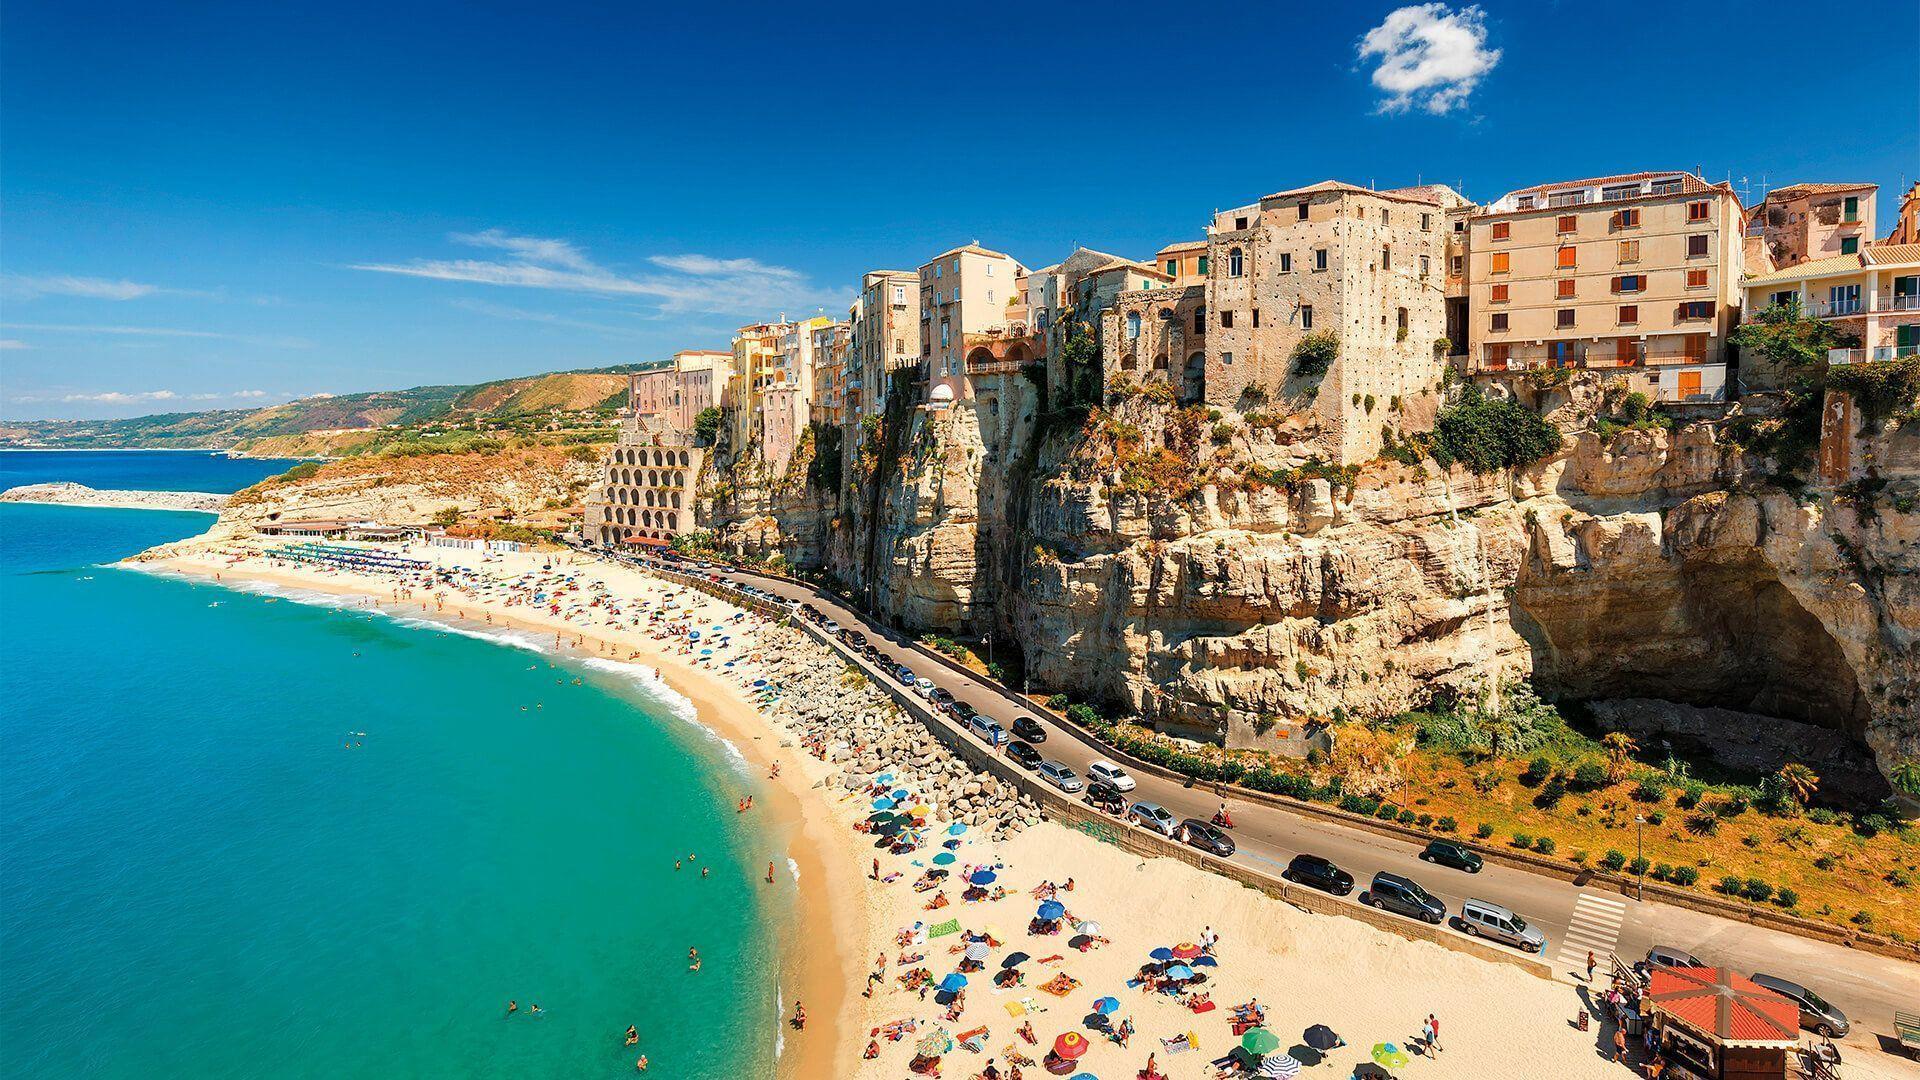 Lamezia Terme - Tourist Guide | Planet of Hotels